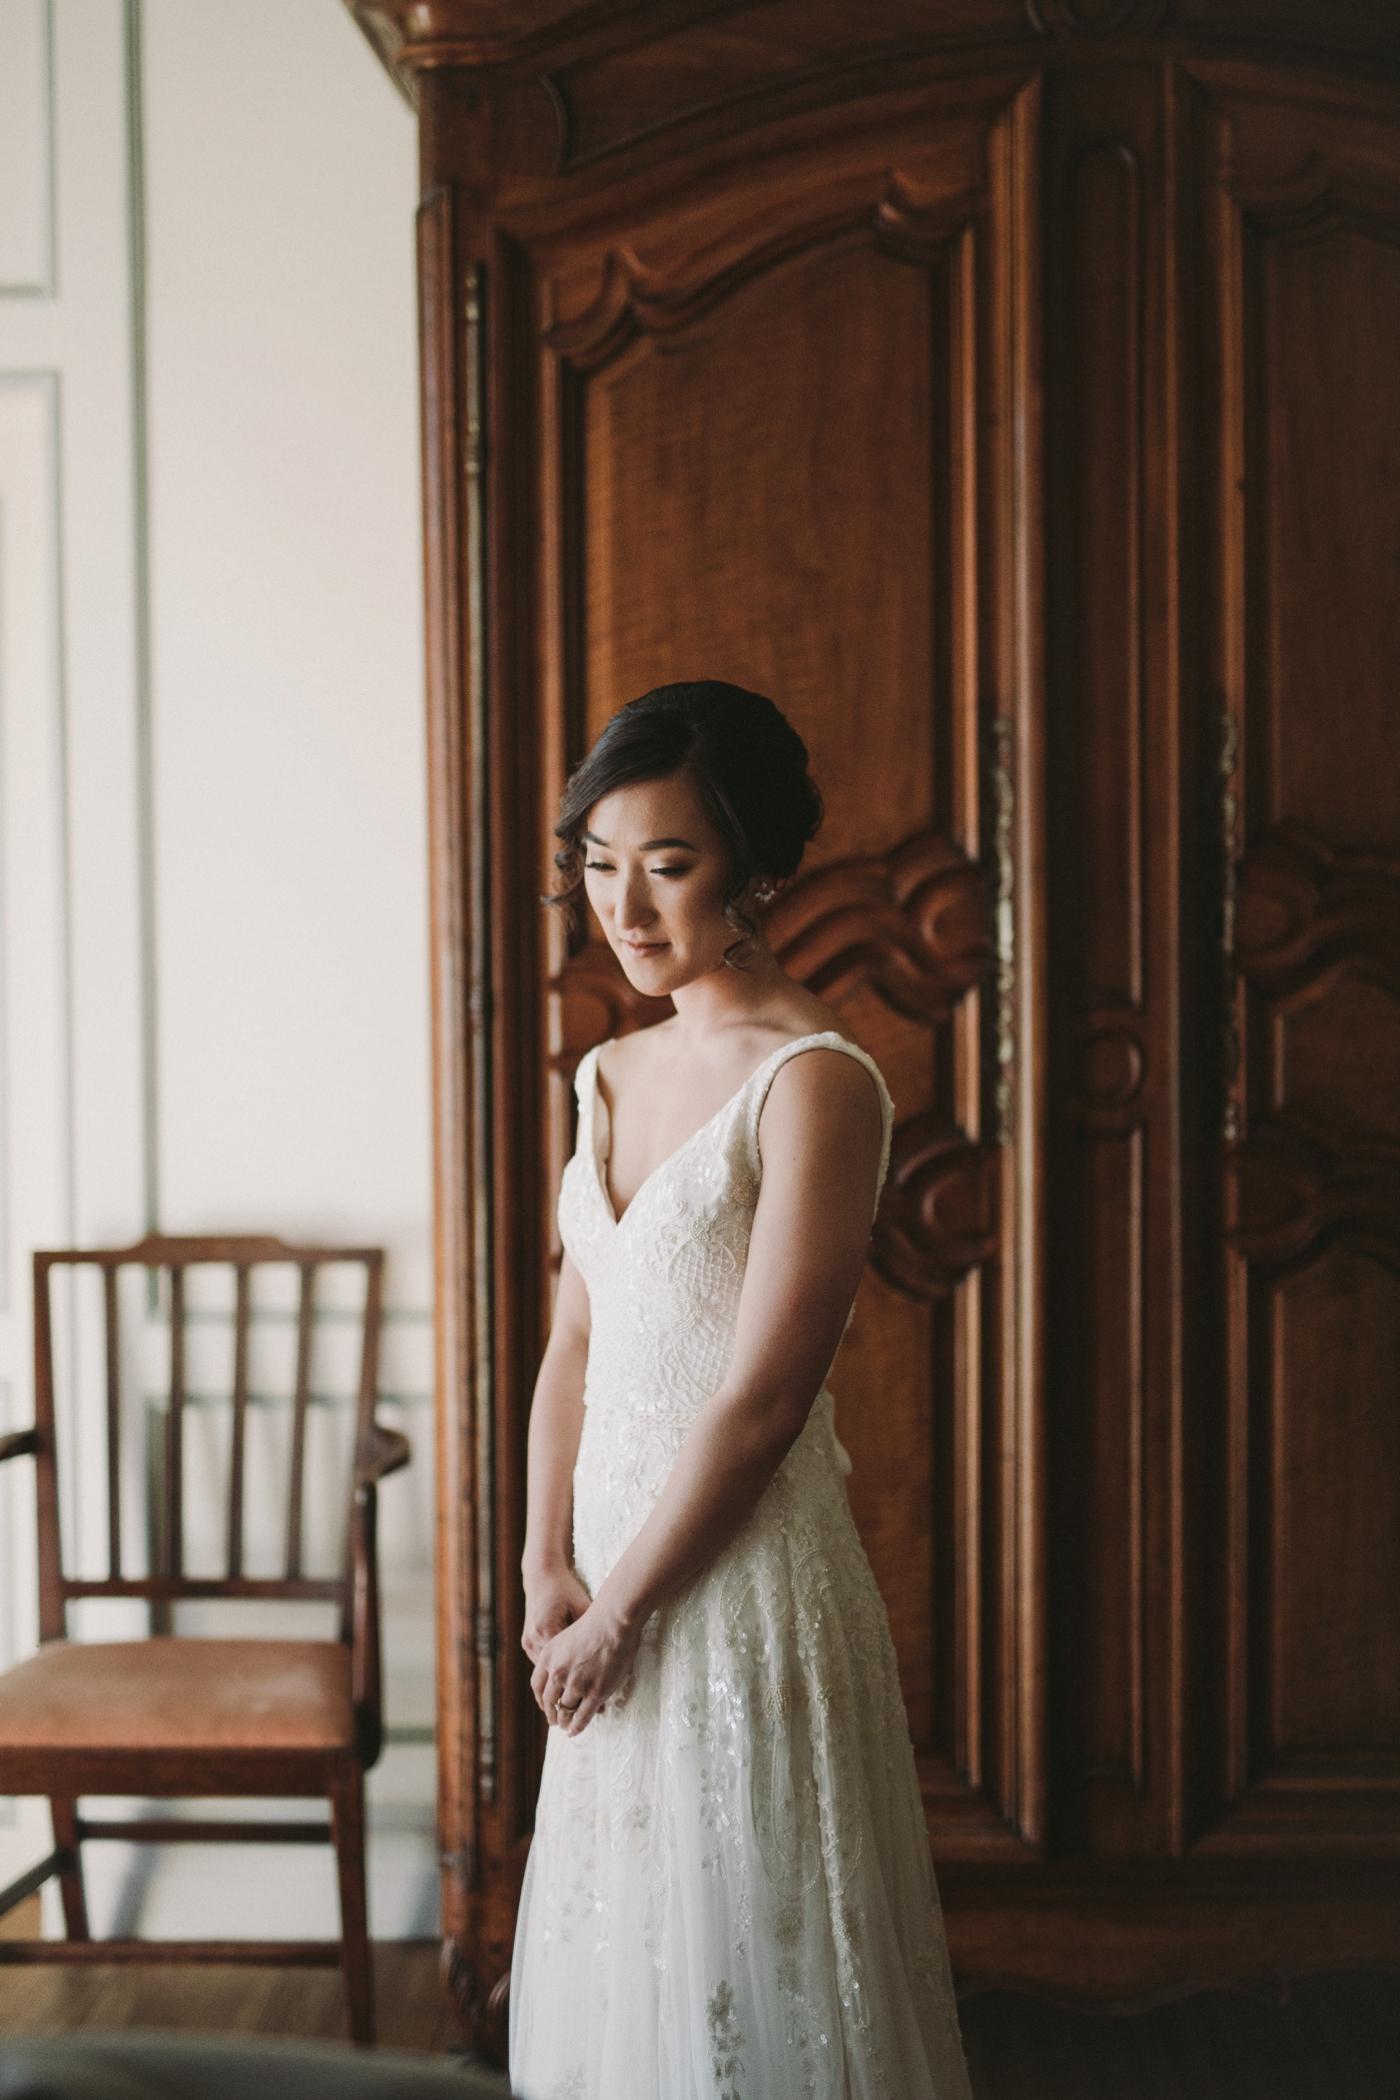 Adelaide Wedding Photographer - Al Ru Farm Wedding in Adelaide - Natural Wedding Photography Australia - www.katherineschultzphotography.com - Todd & Rachel_0018.jpg